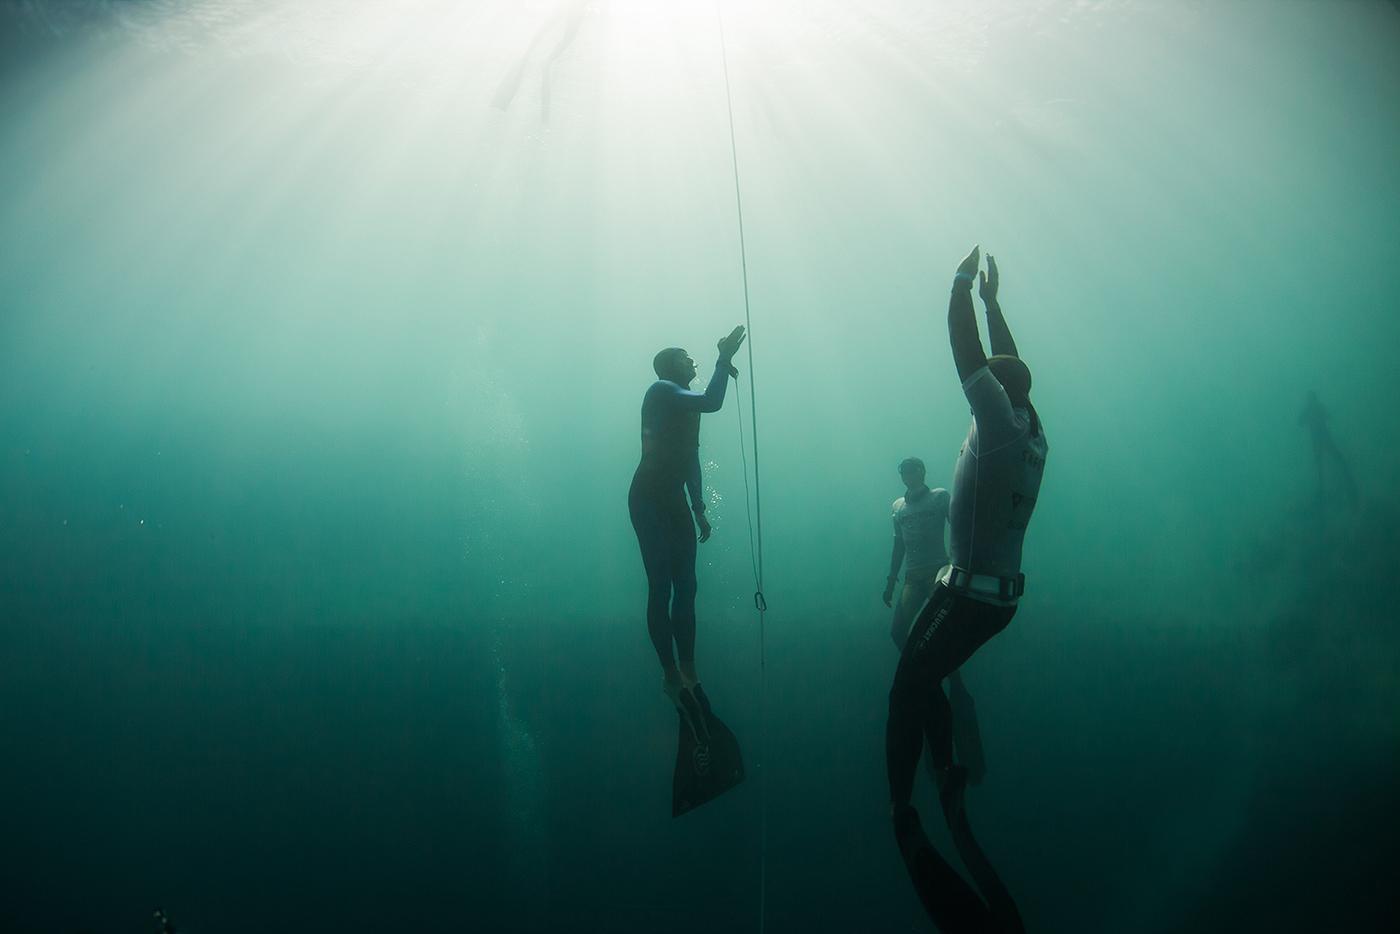 Vertical Blue Freediving photo Logan Mock-Bunting